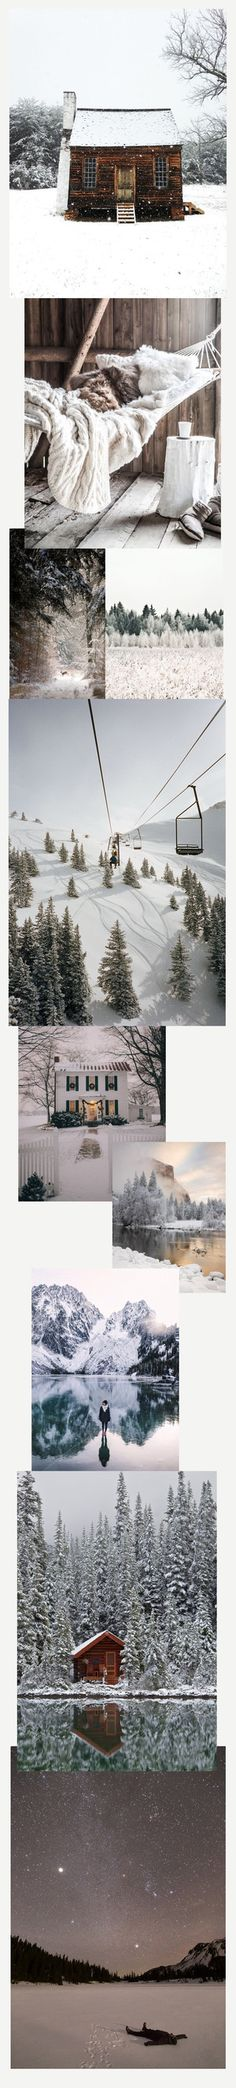 Travel Daydreaming: Winter Wonderland by The Wanderlove Collective Zine, Winter Wonderland, Travel Inspiration, Collage, Creative, Collages, Collage Art, Colleges